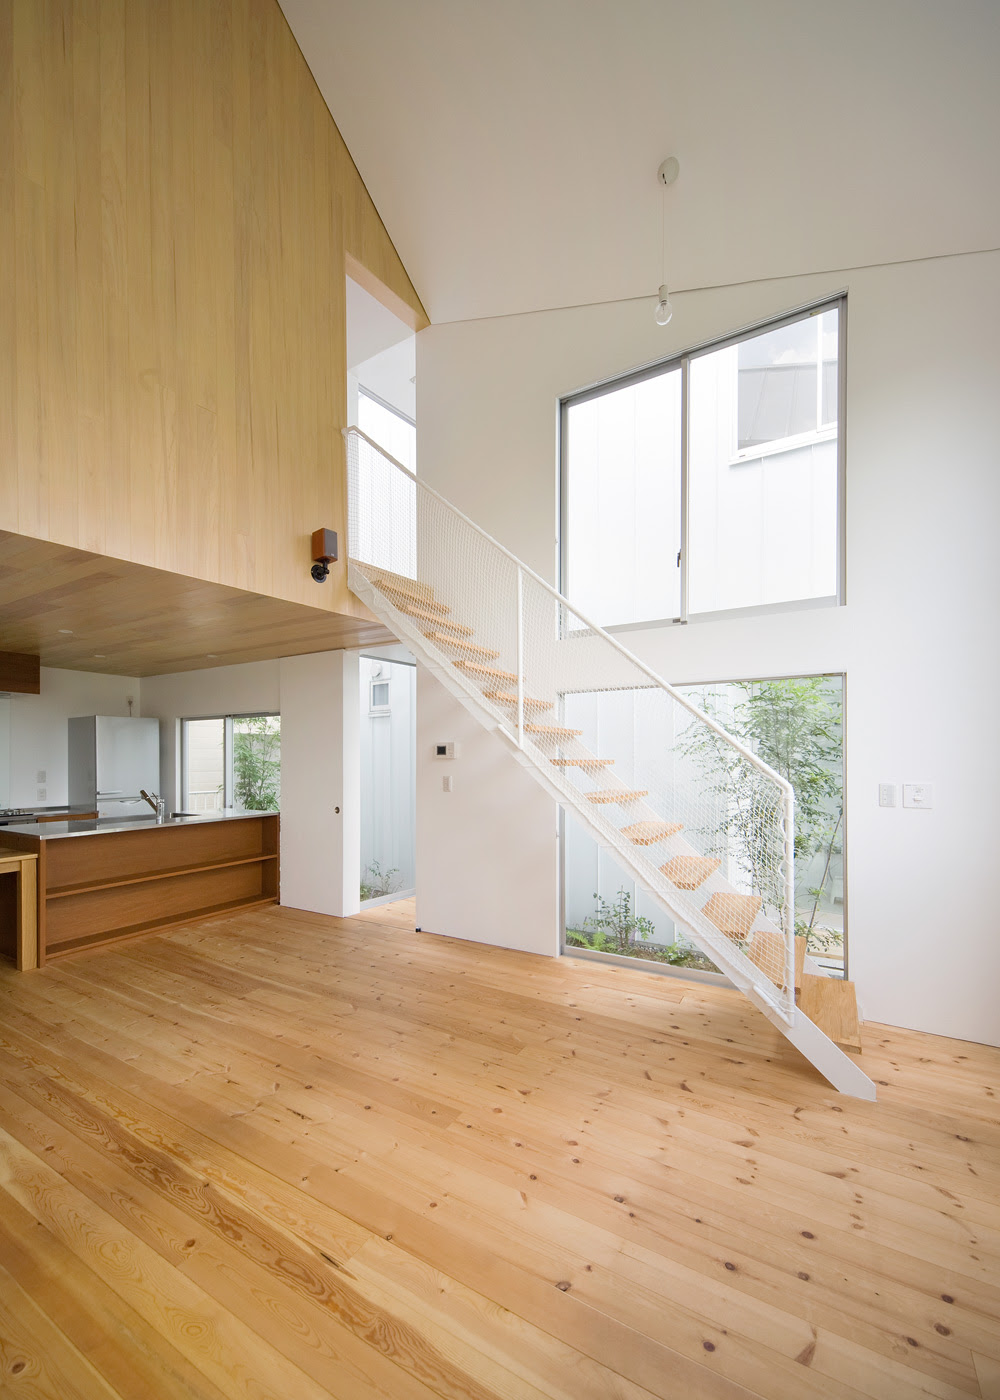 Casa Doble - Architect Associates Tonoma, arquitectura, casas